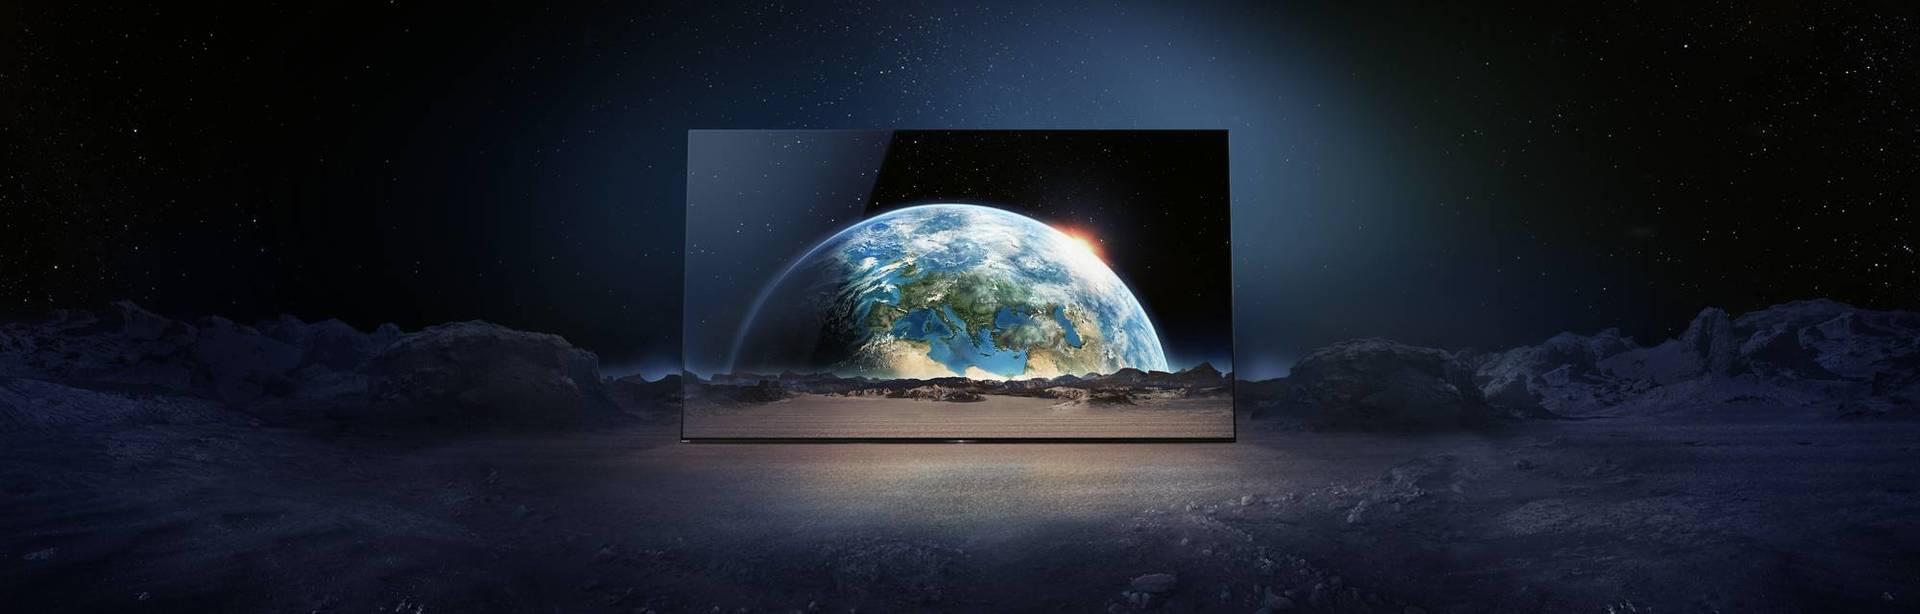 Sony Televisions, sony 4k tvs, sony 4k, sony tv near me